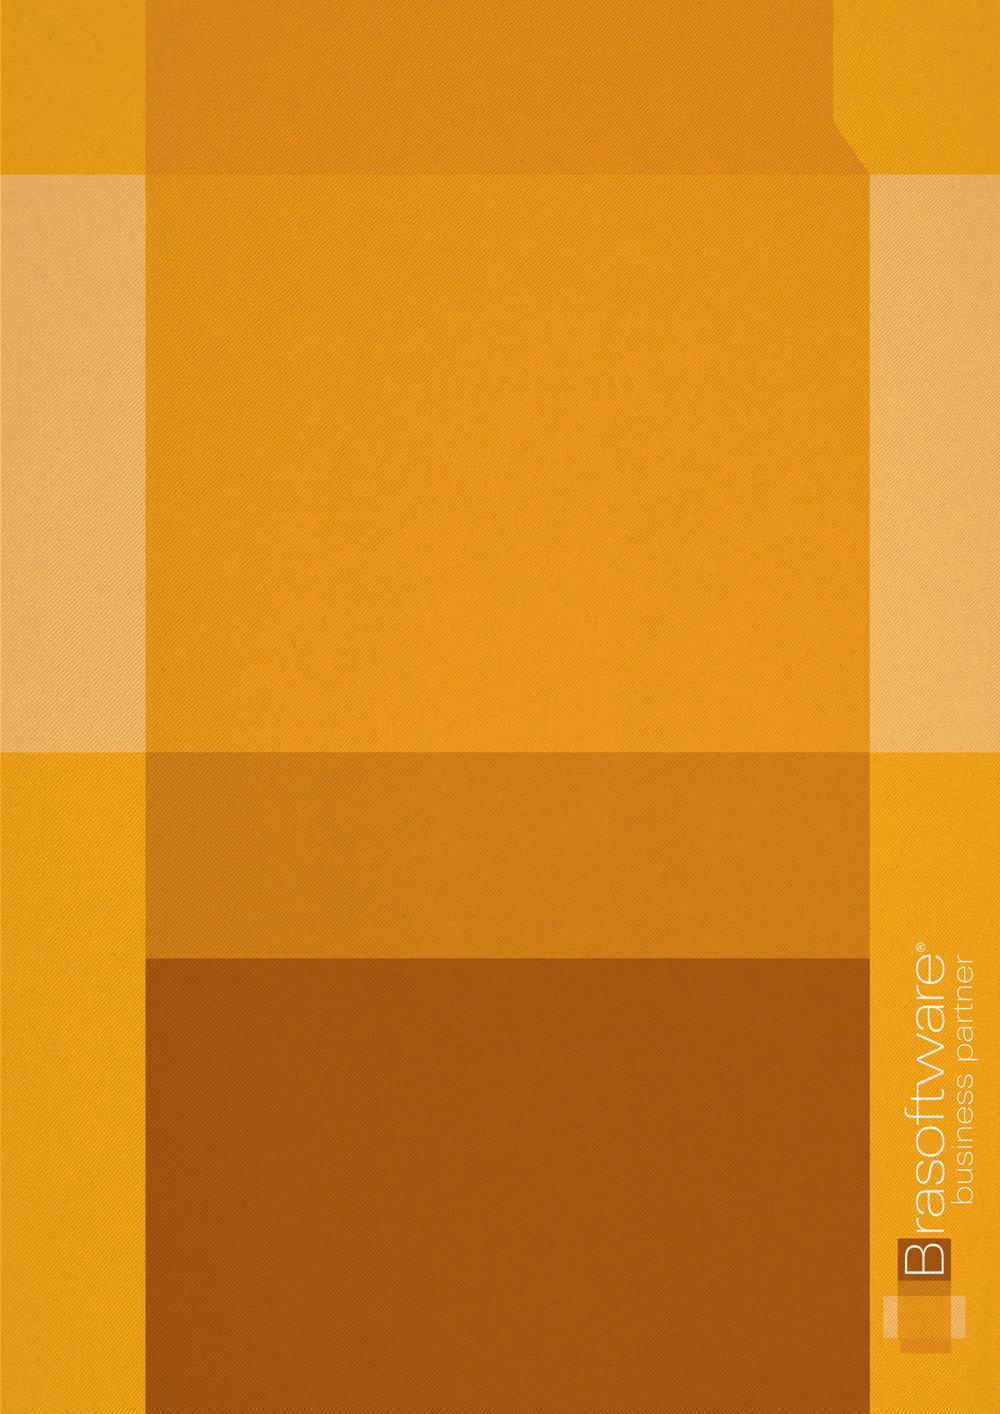 brasoftware-poster-2.jpg